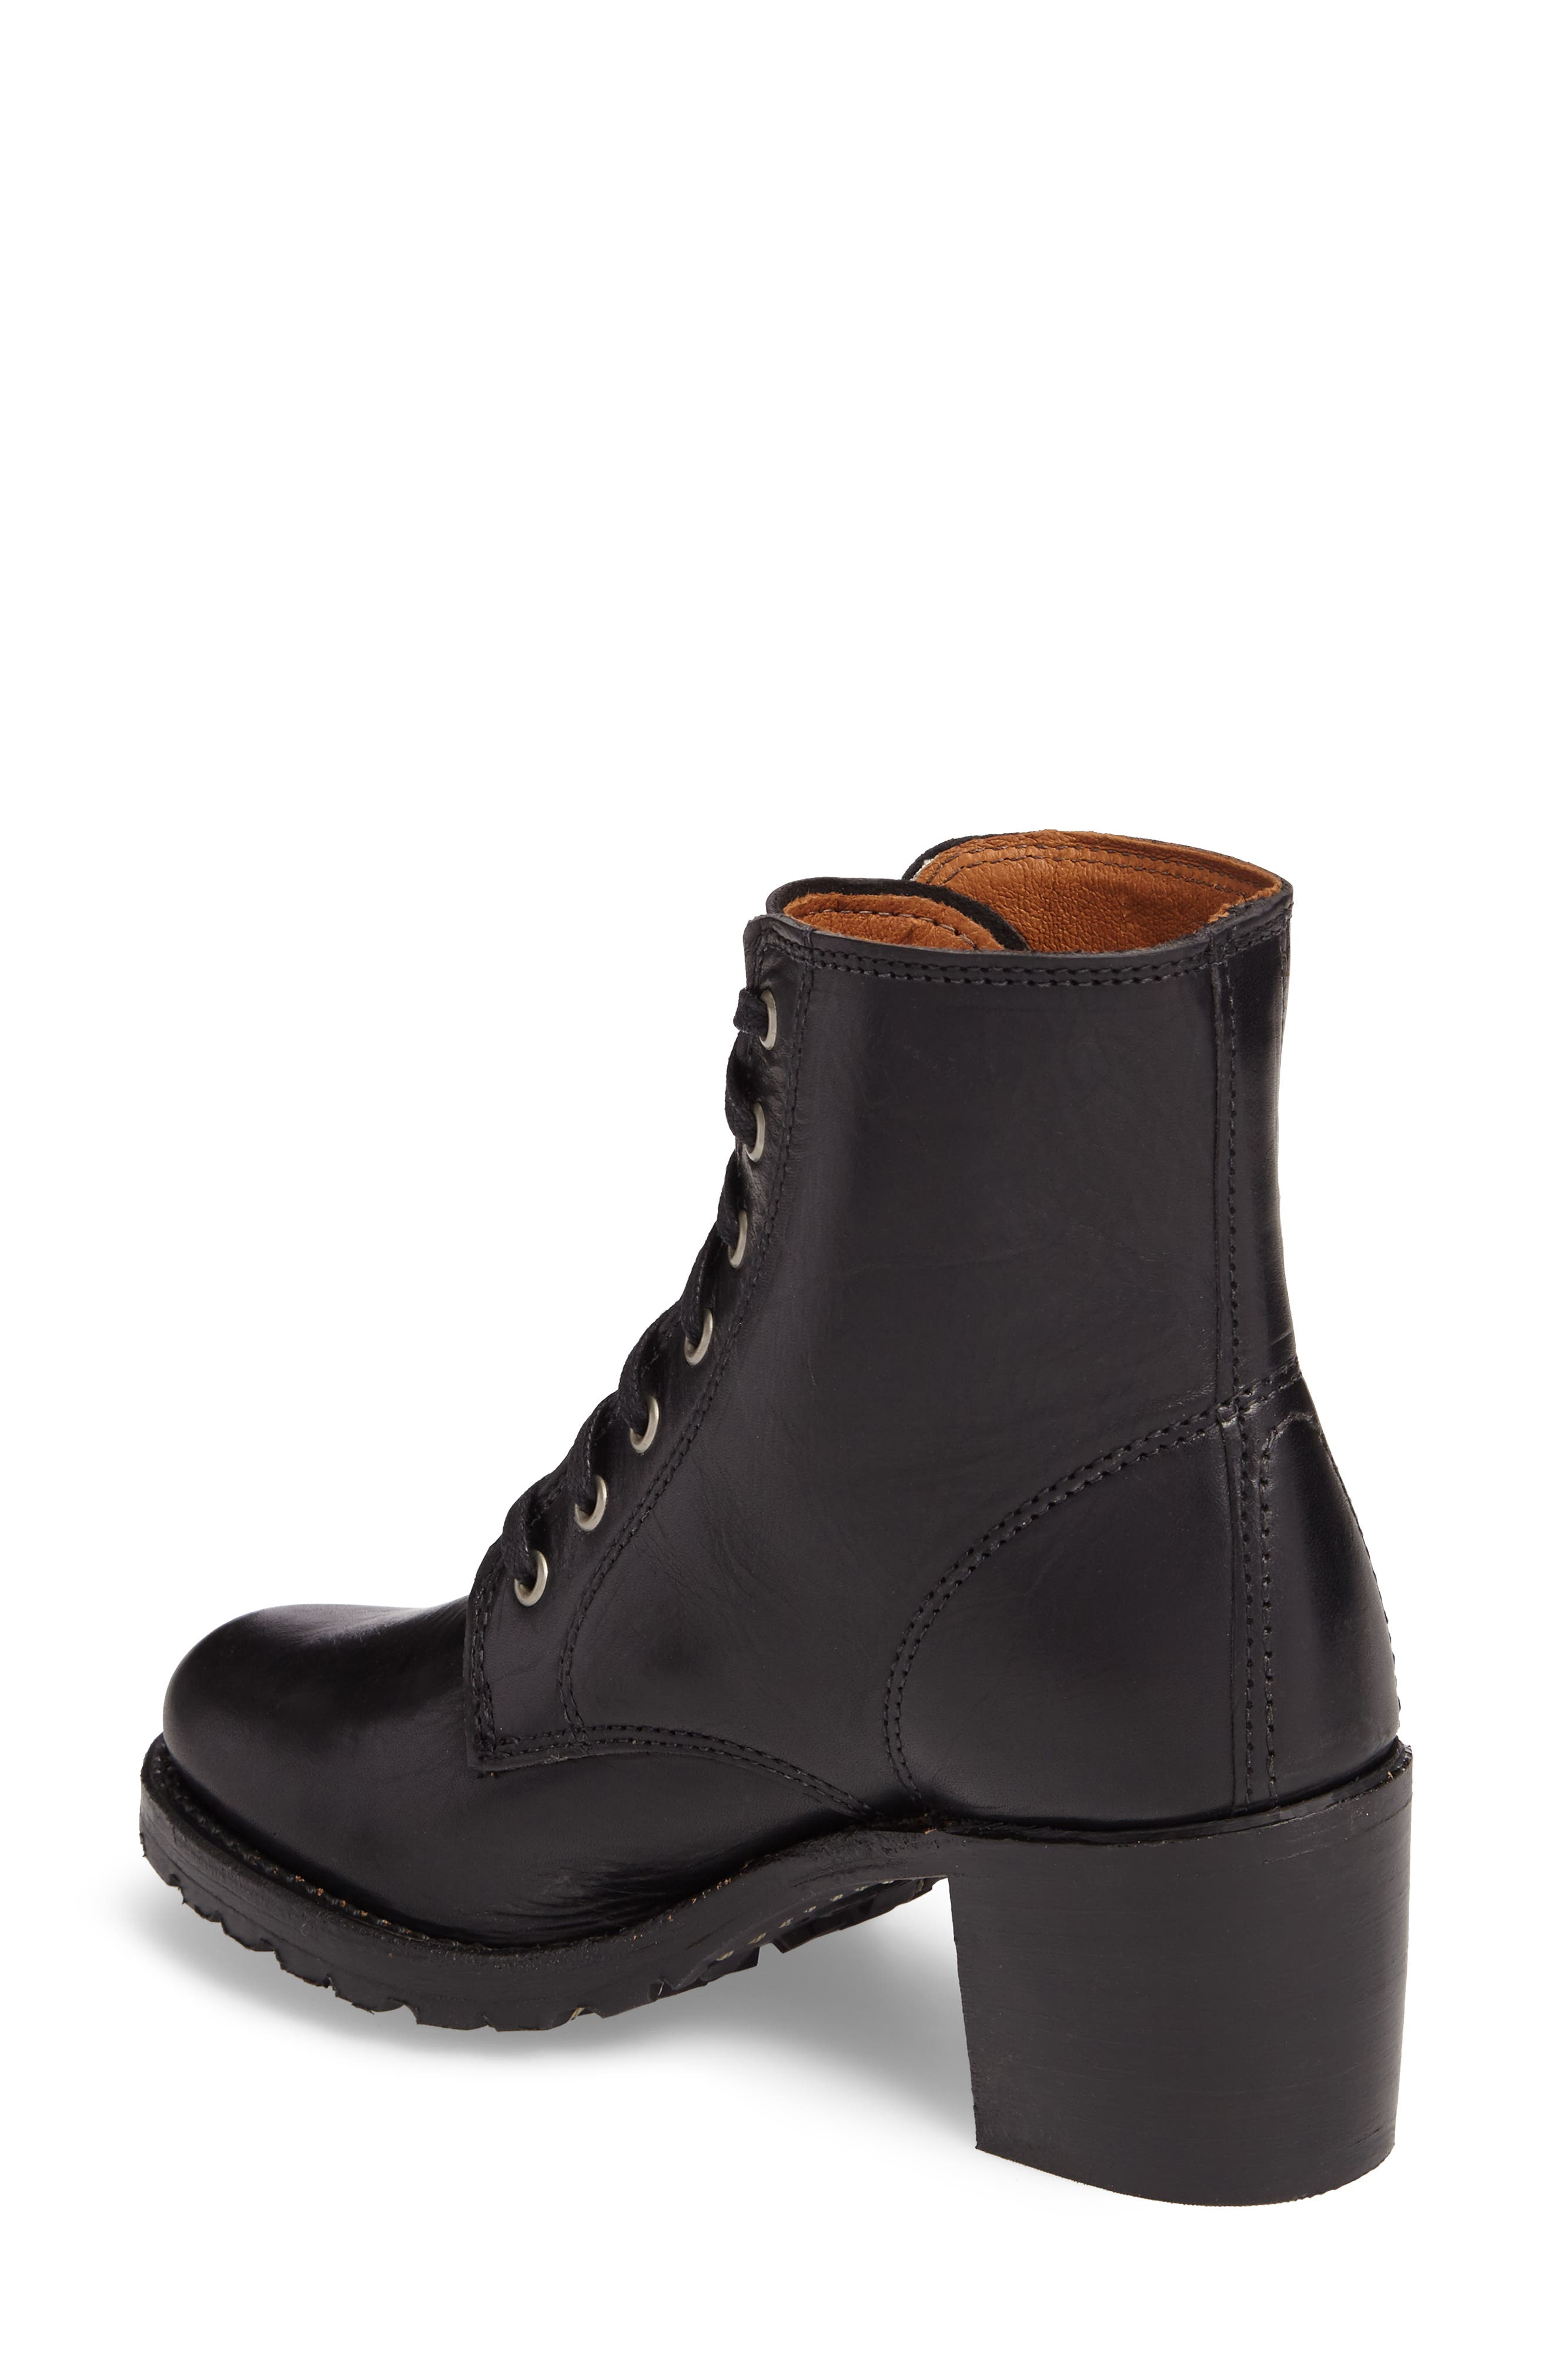 Sabrina 6G Lace-Up Boot,                             Alternate thumbnail 2, color,                             BLACK